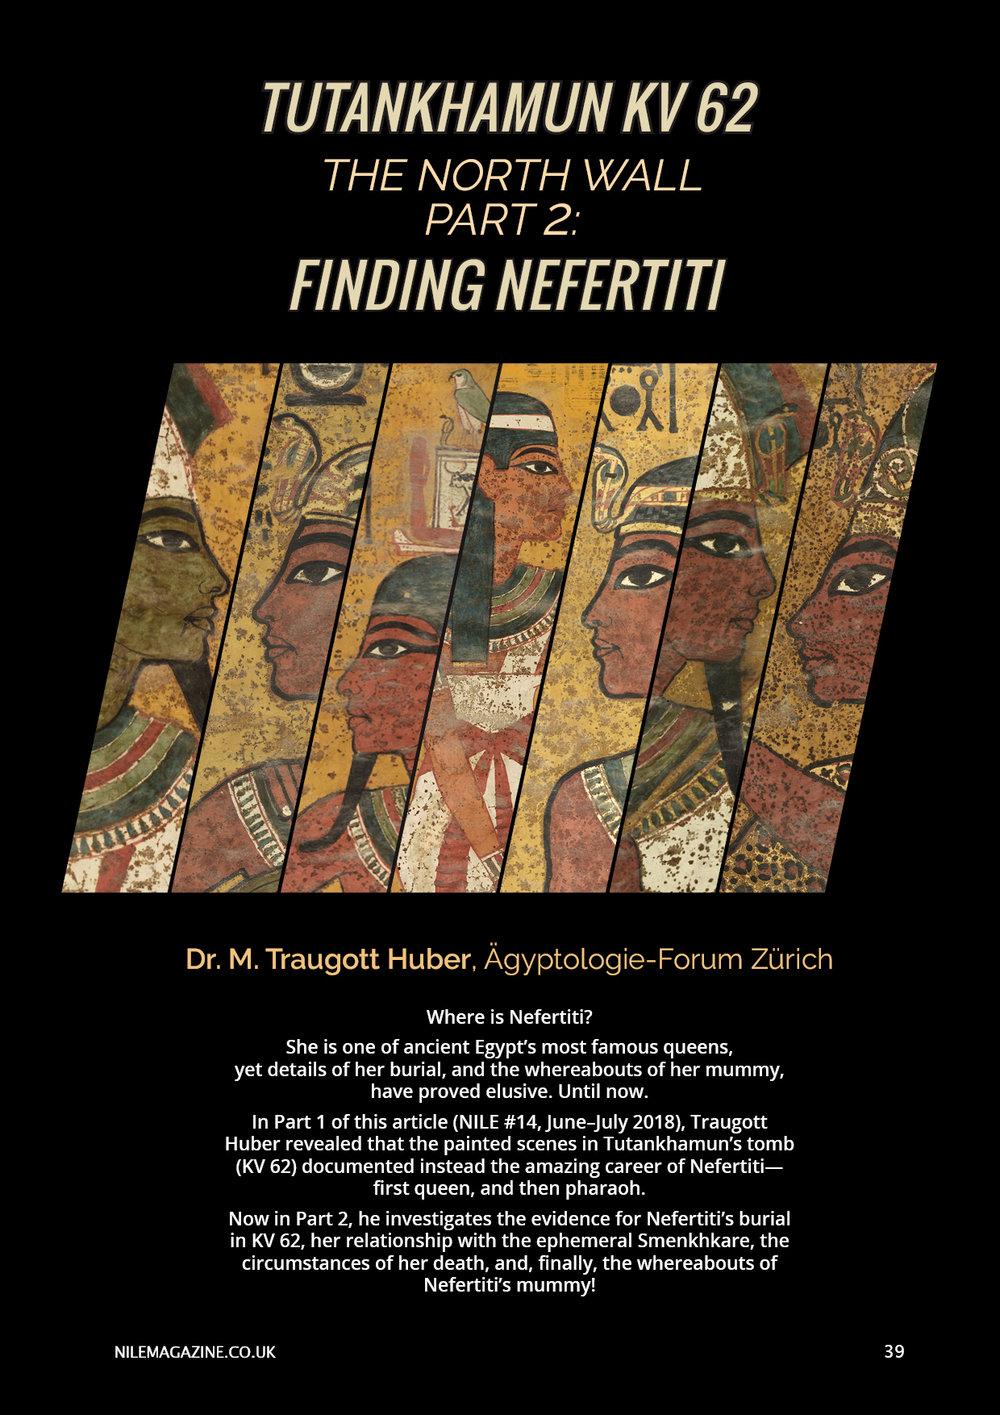 Nile 17, Finding Nefertiti 1 1A.jpg